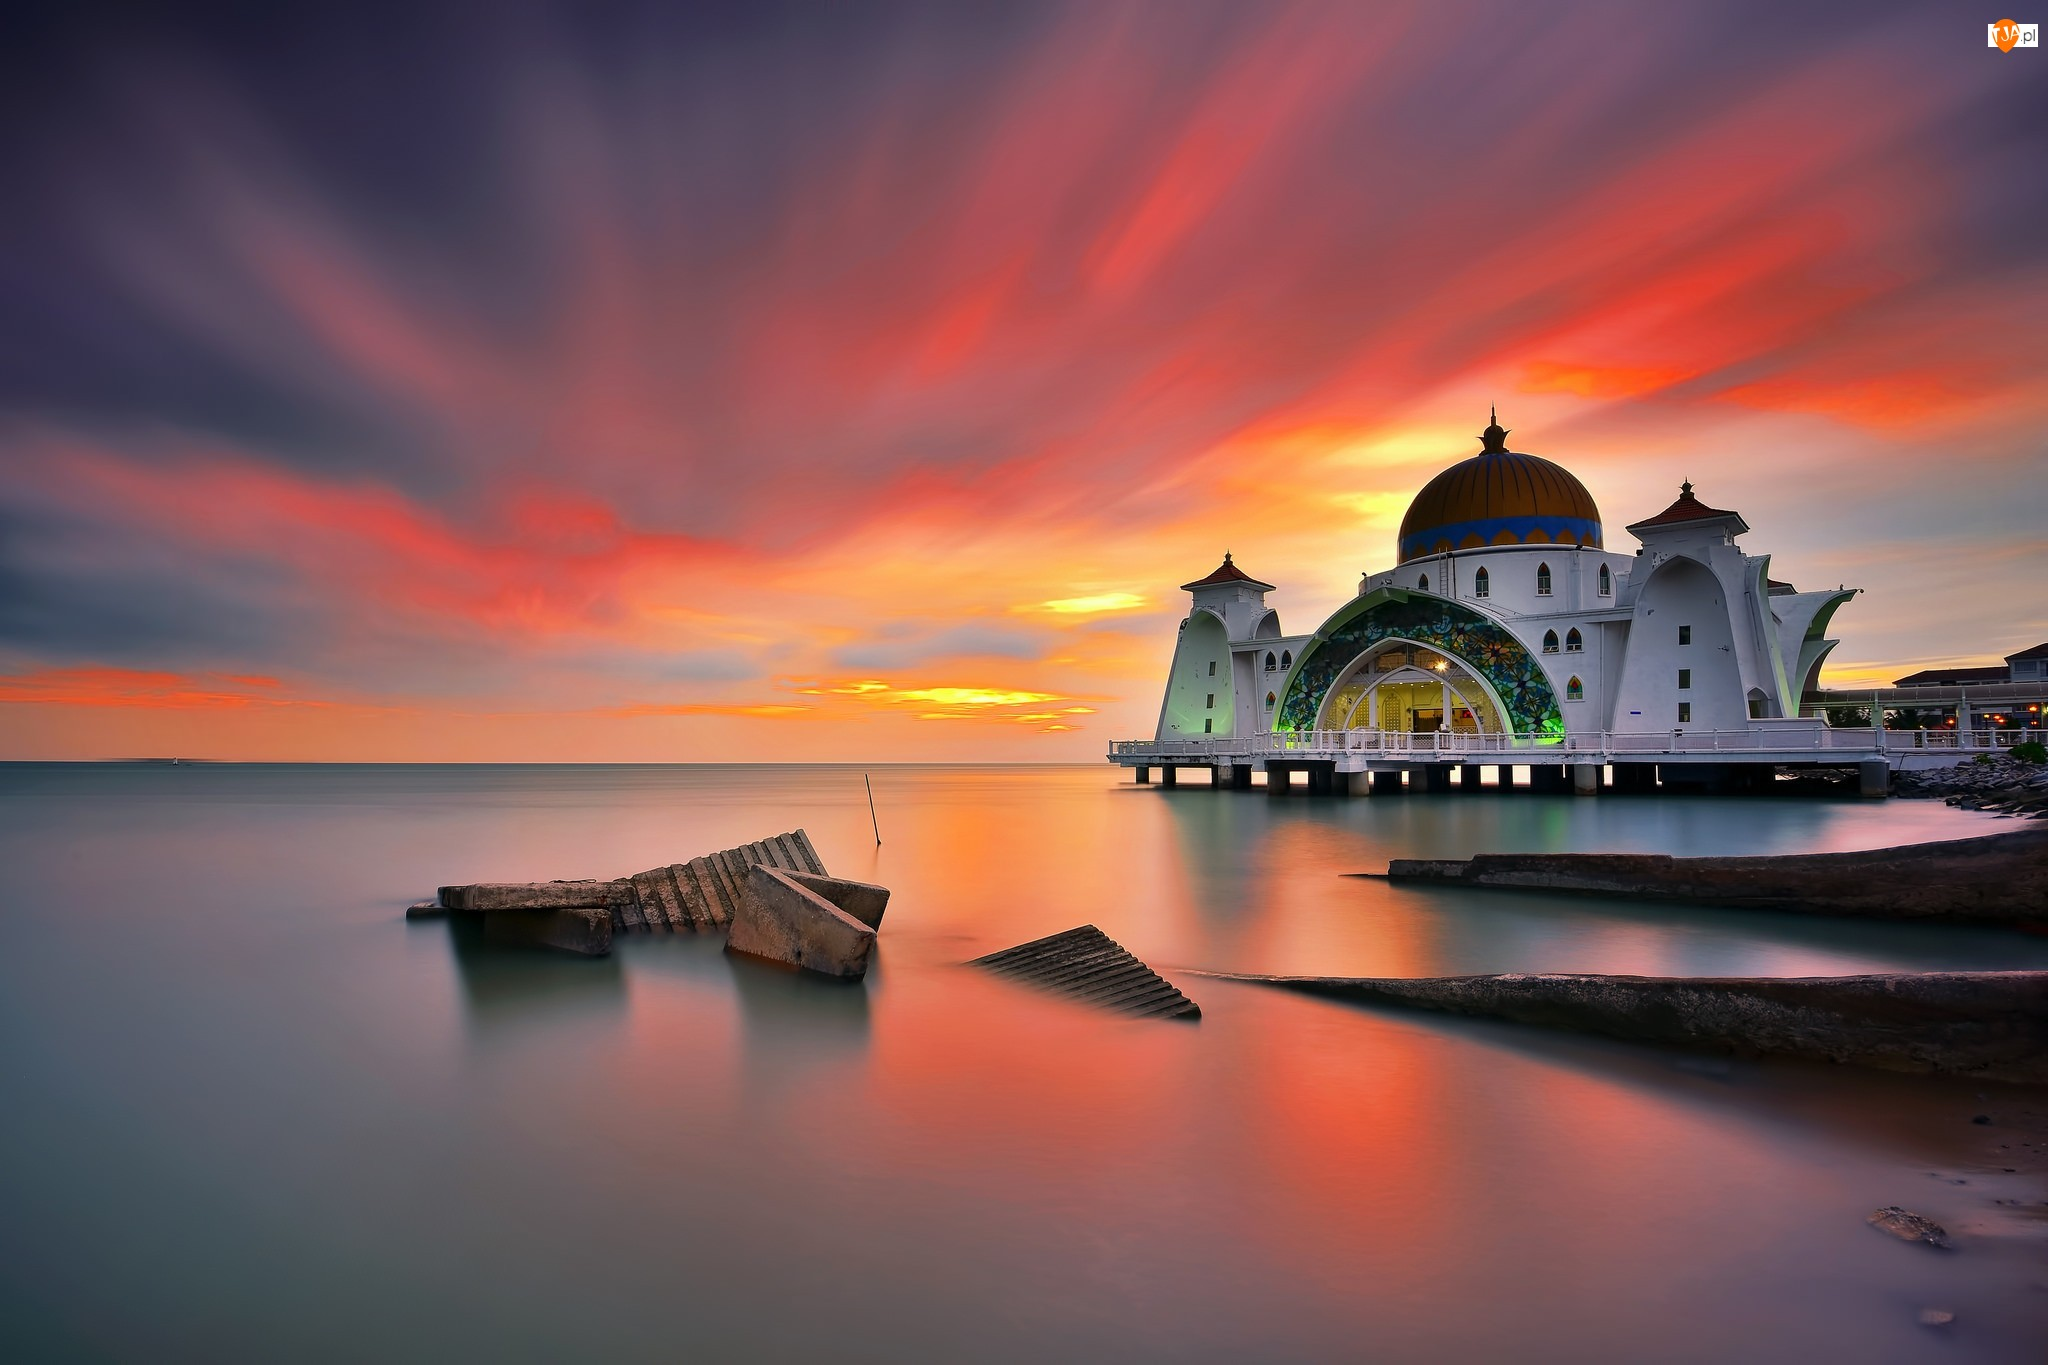 Malezja, Zachód słońca, Cieśnina Malakka, Meczet